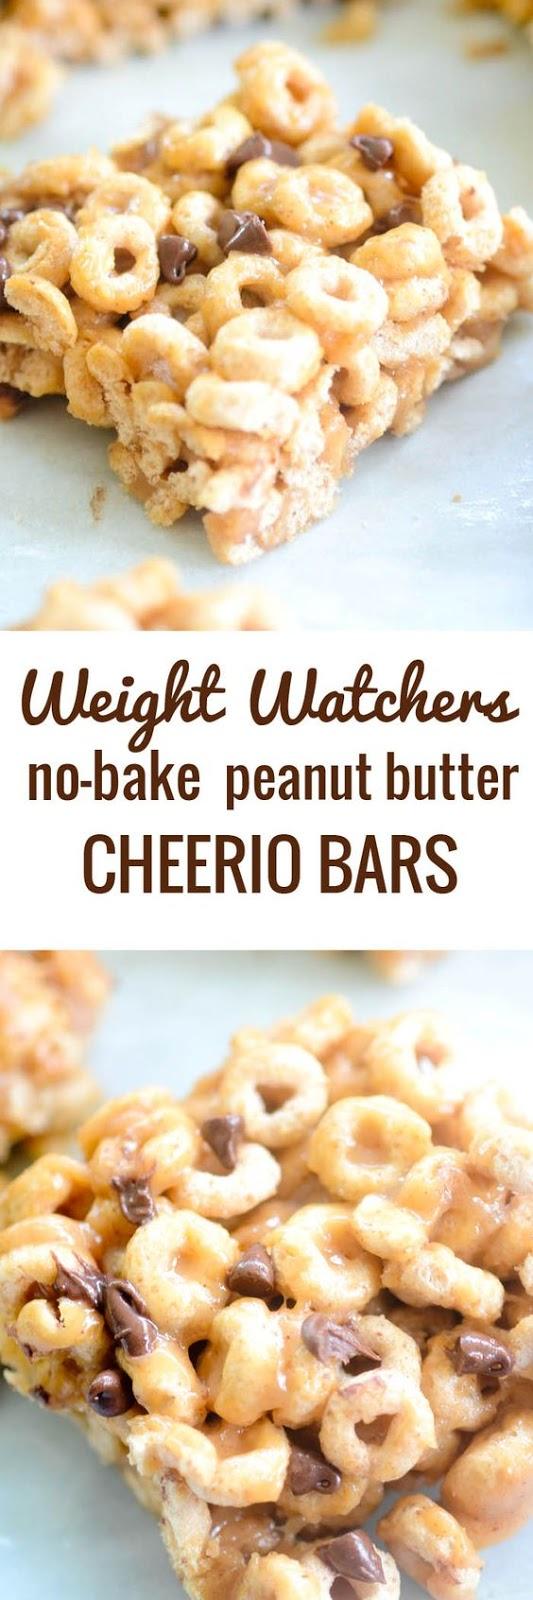 weight watchers no bake peanut butter cheerio bars